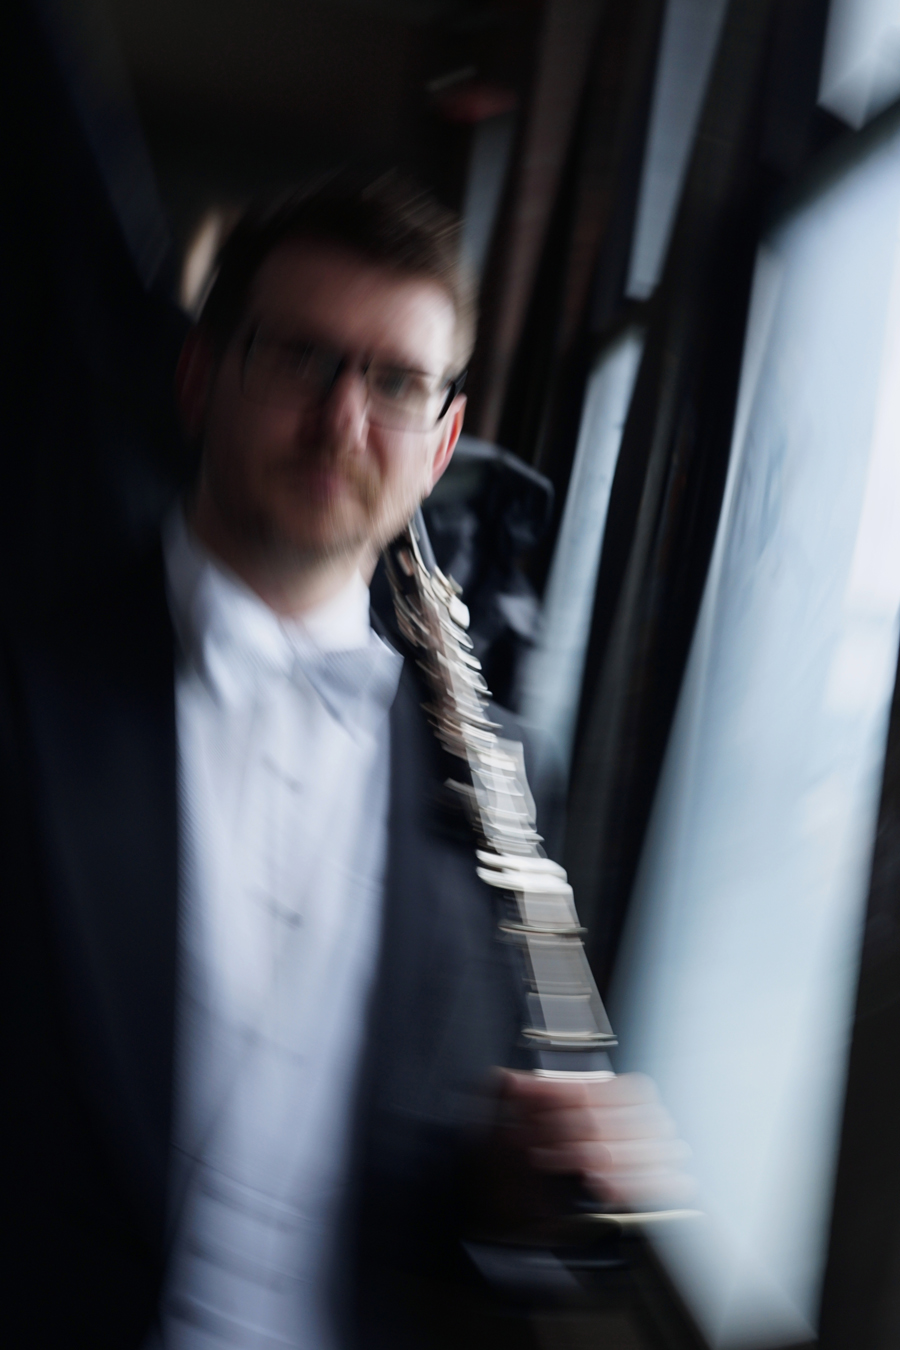 Matthew Nelson Clarinet by Tina Gutierrez 37Re